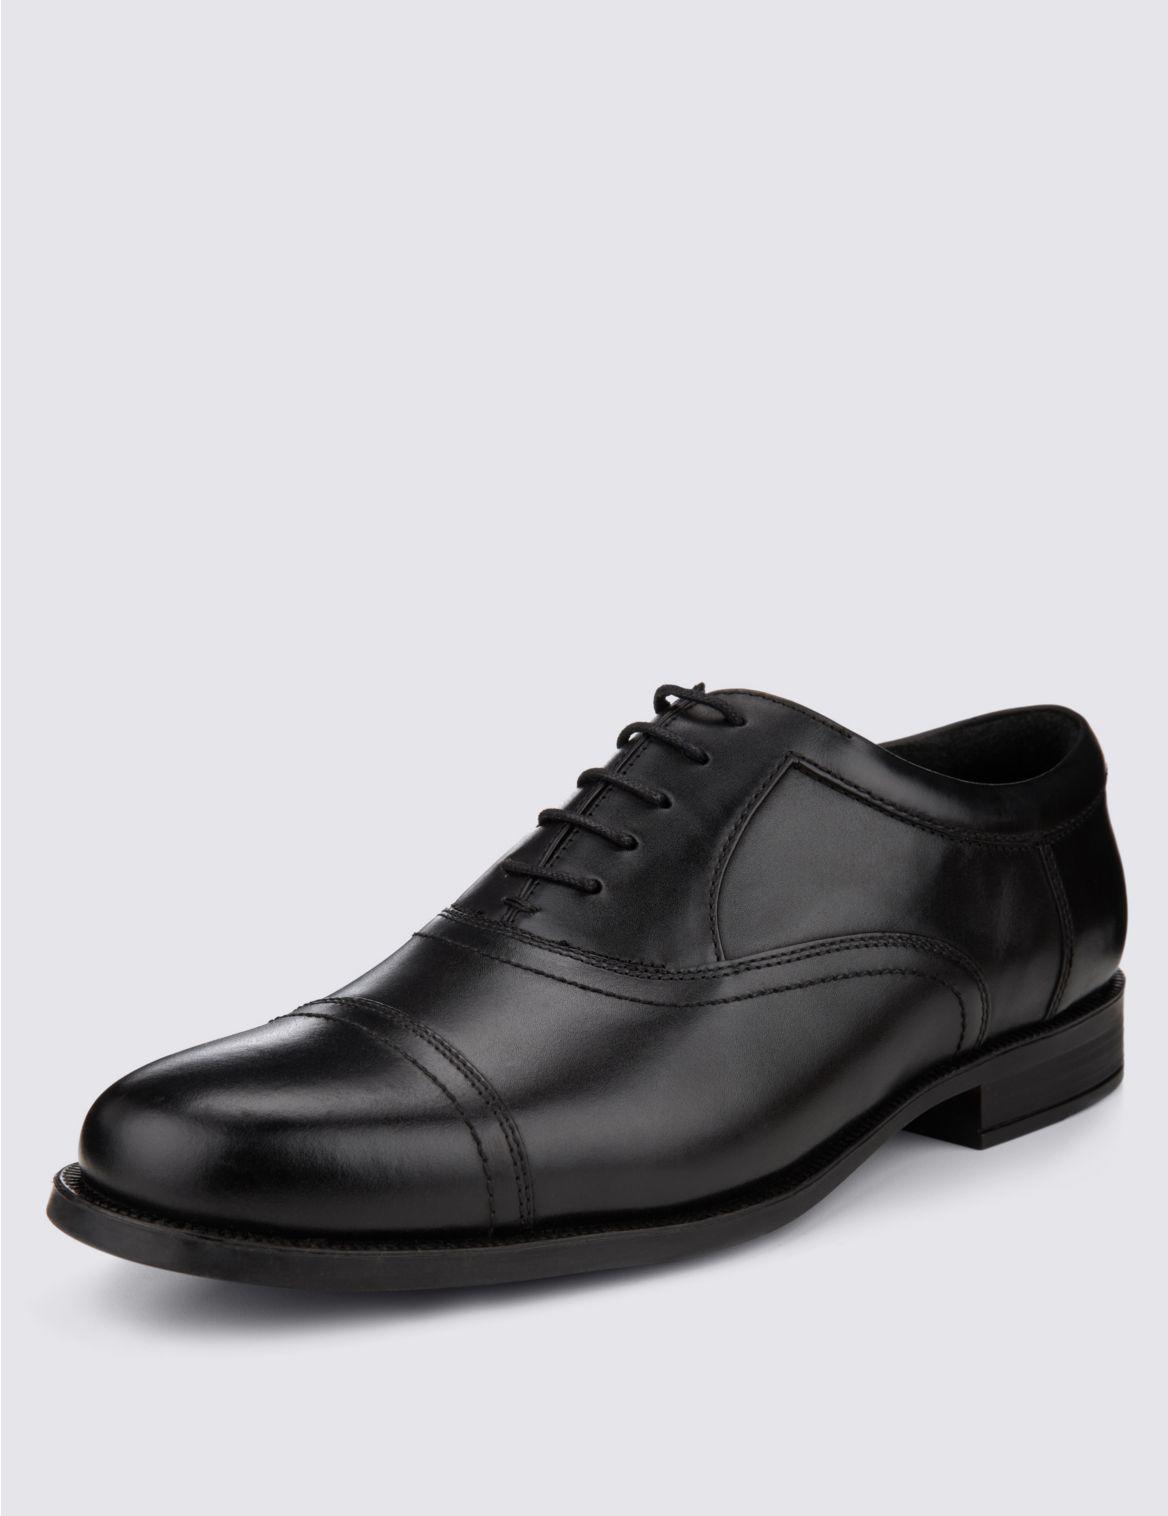 Chaussures Oxford extra-larges en cuir ? lacets. StyleForme du produit:?€ lacets;Coupe:Coupe extra-large;Bout rond ;D??tail couture ;Talons plat